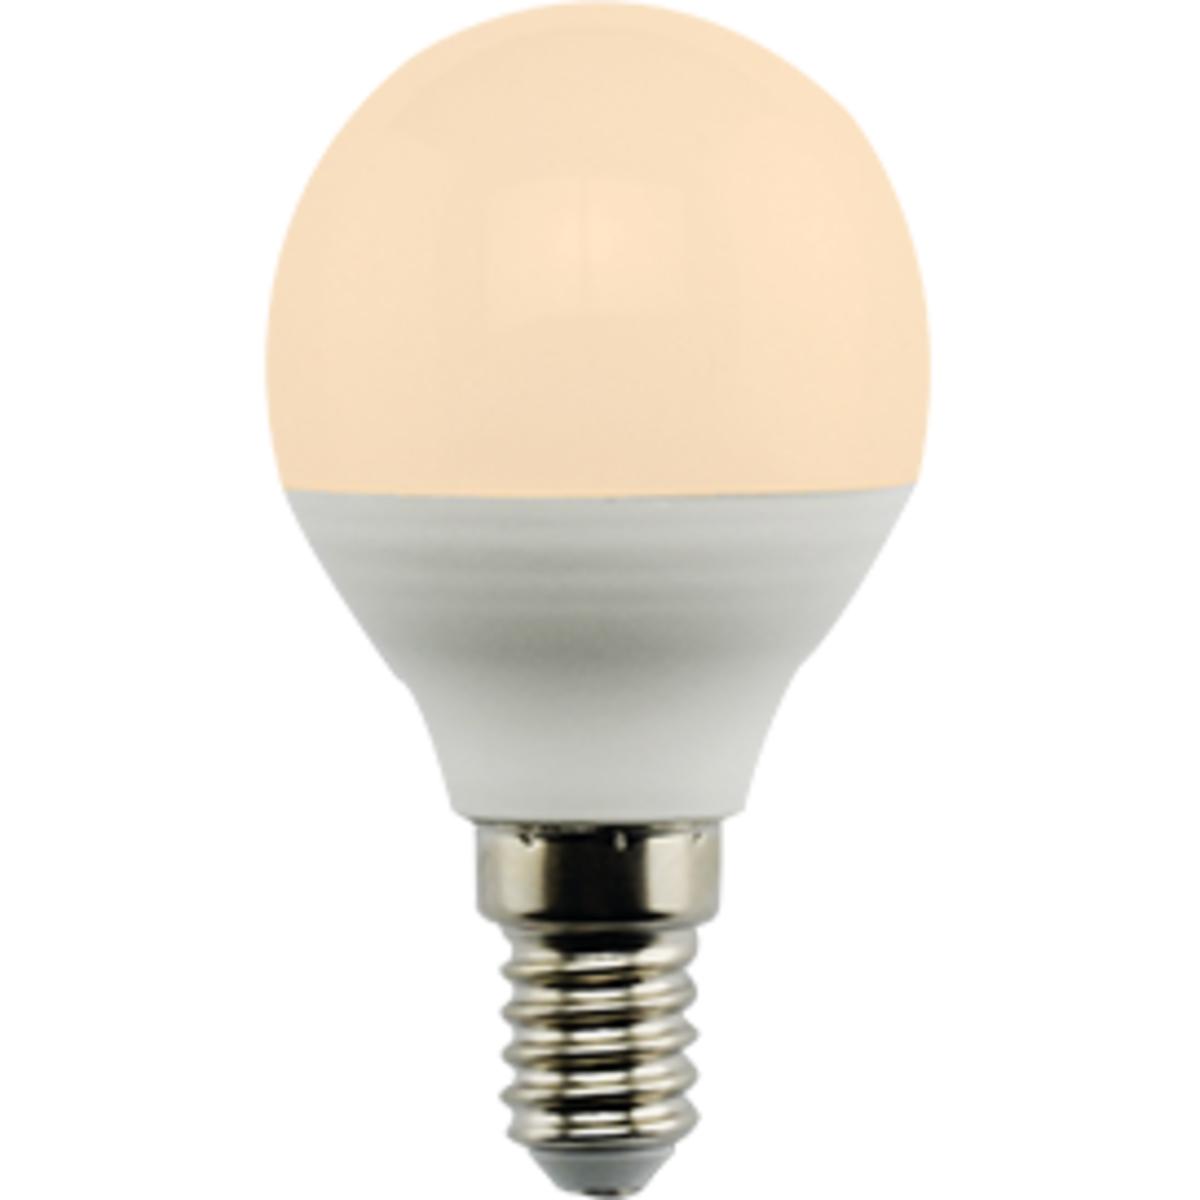 Лампа Ecola Premium светодионая E14 7 Вт шар 560 Лм теплый свет